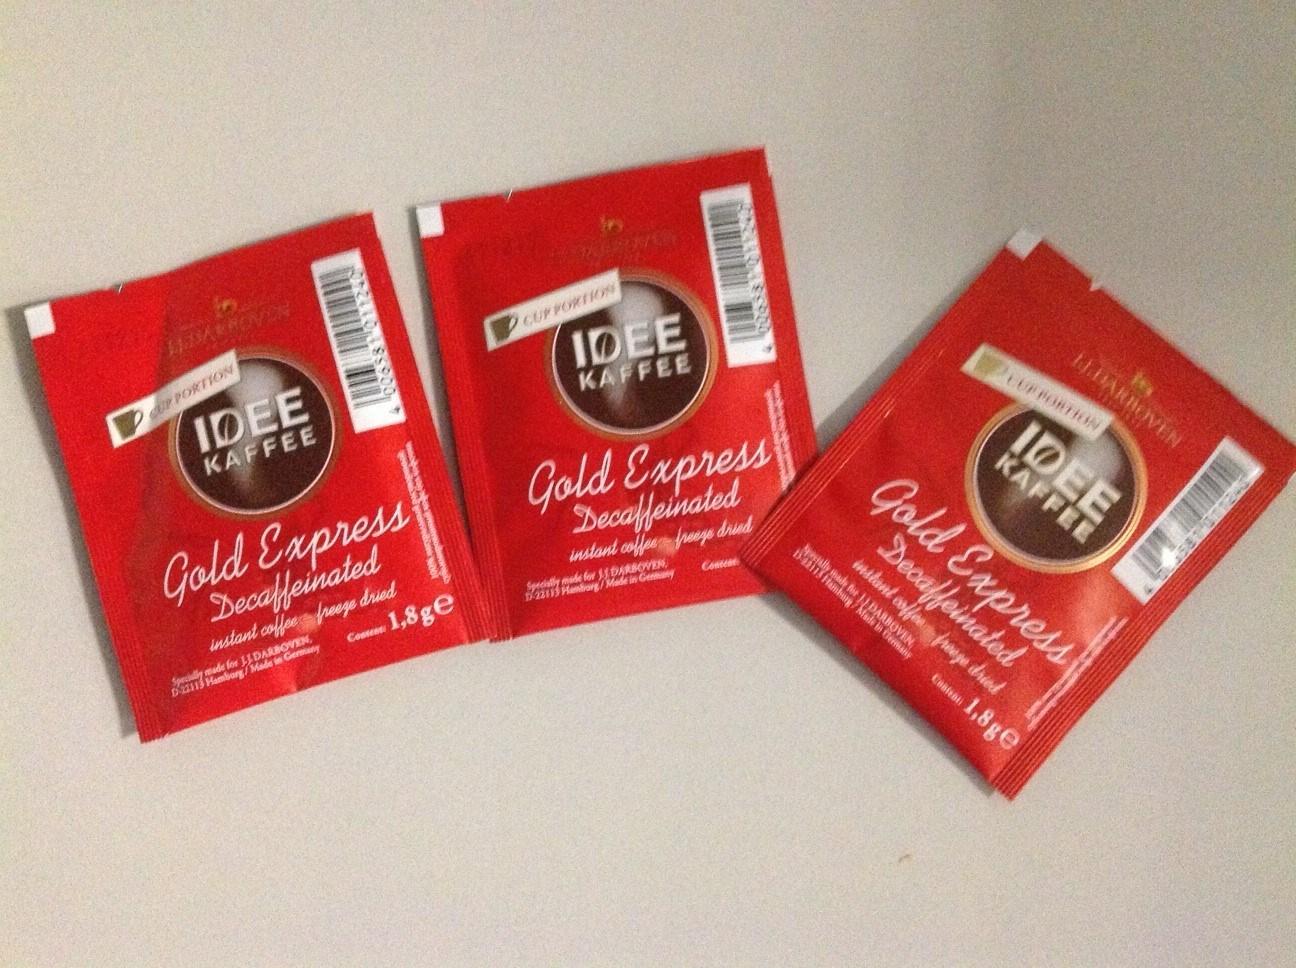 Productafbeelding IDEE KAFFEE Gold Express Sachet Caffeine vrij